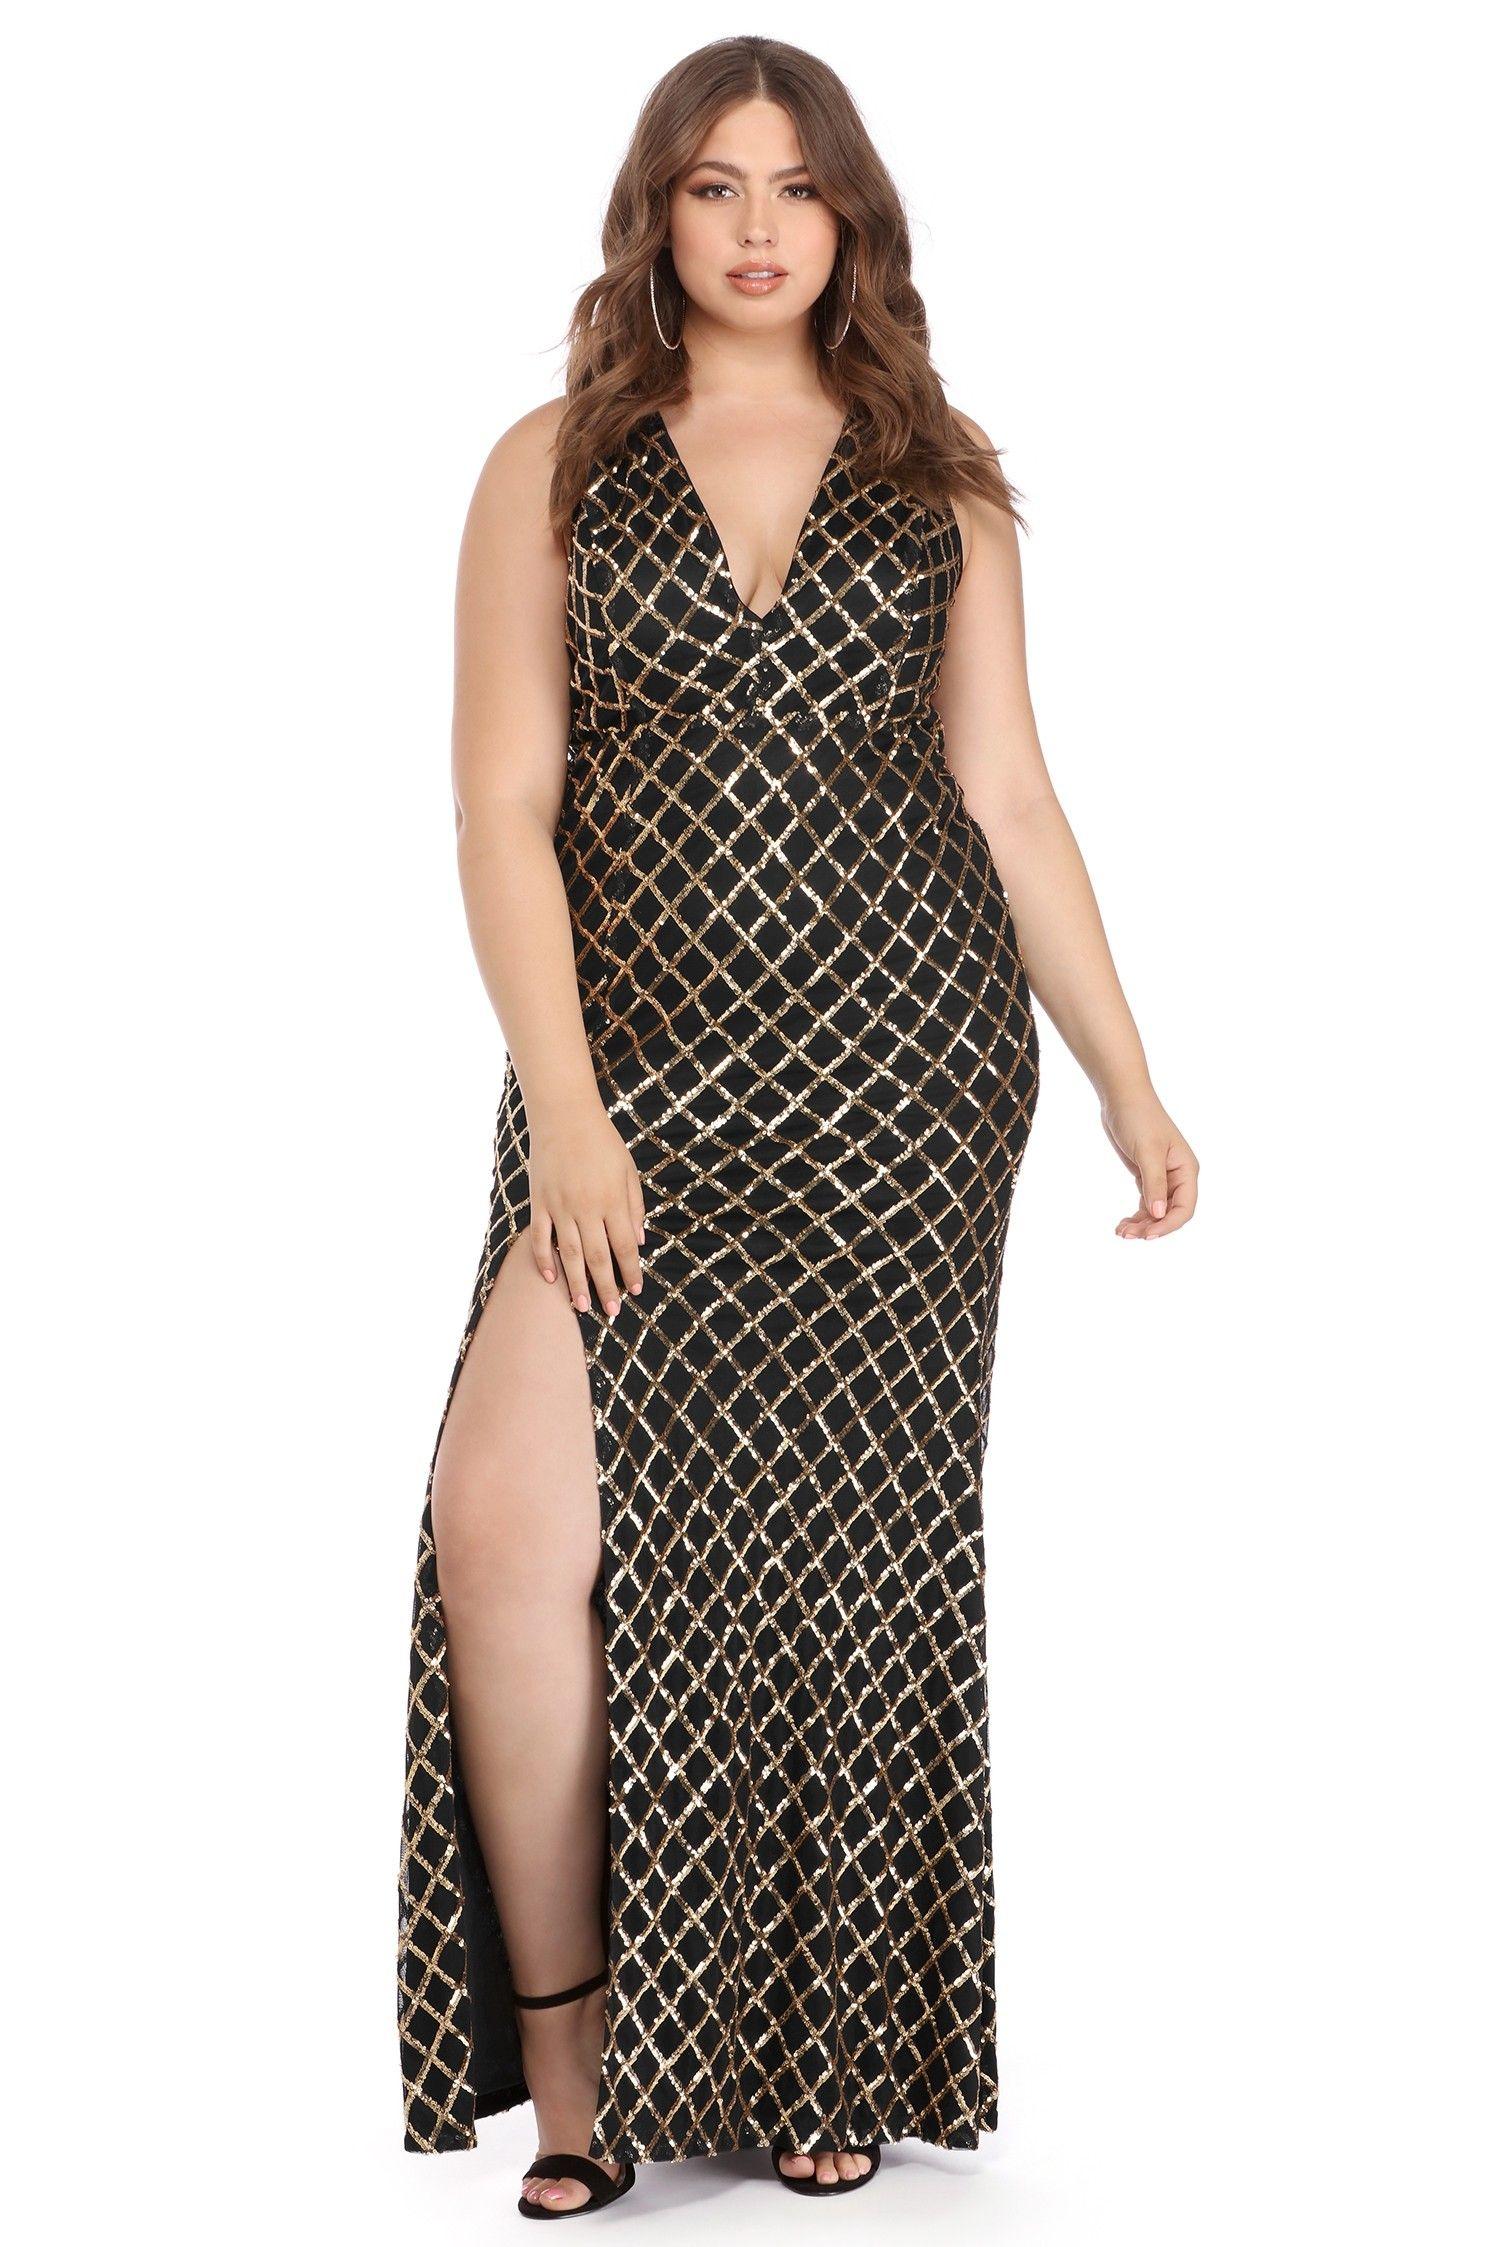 Plus Angelina Black Diamond Sequin Dress Windsor Plus